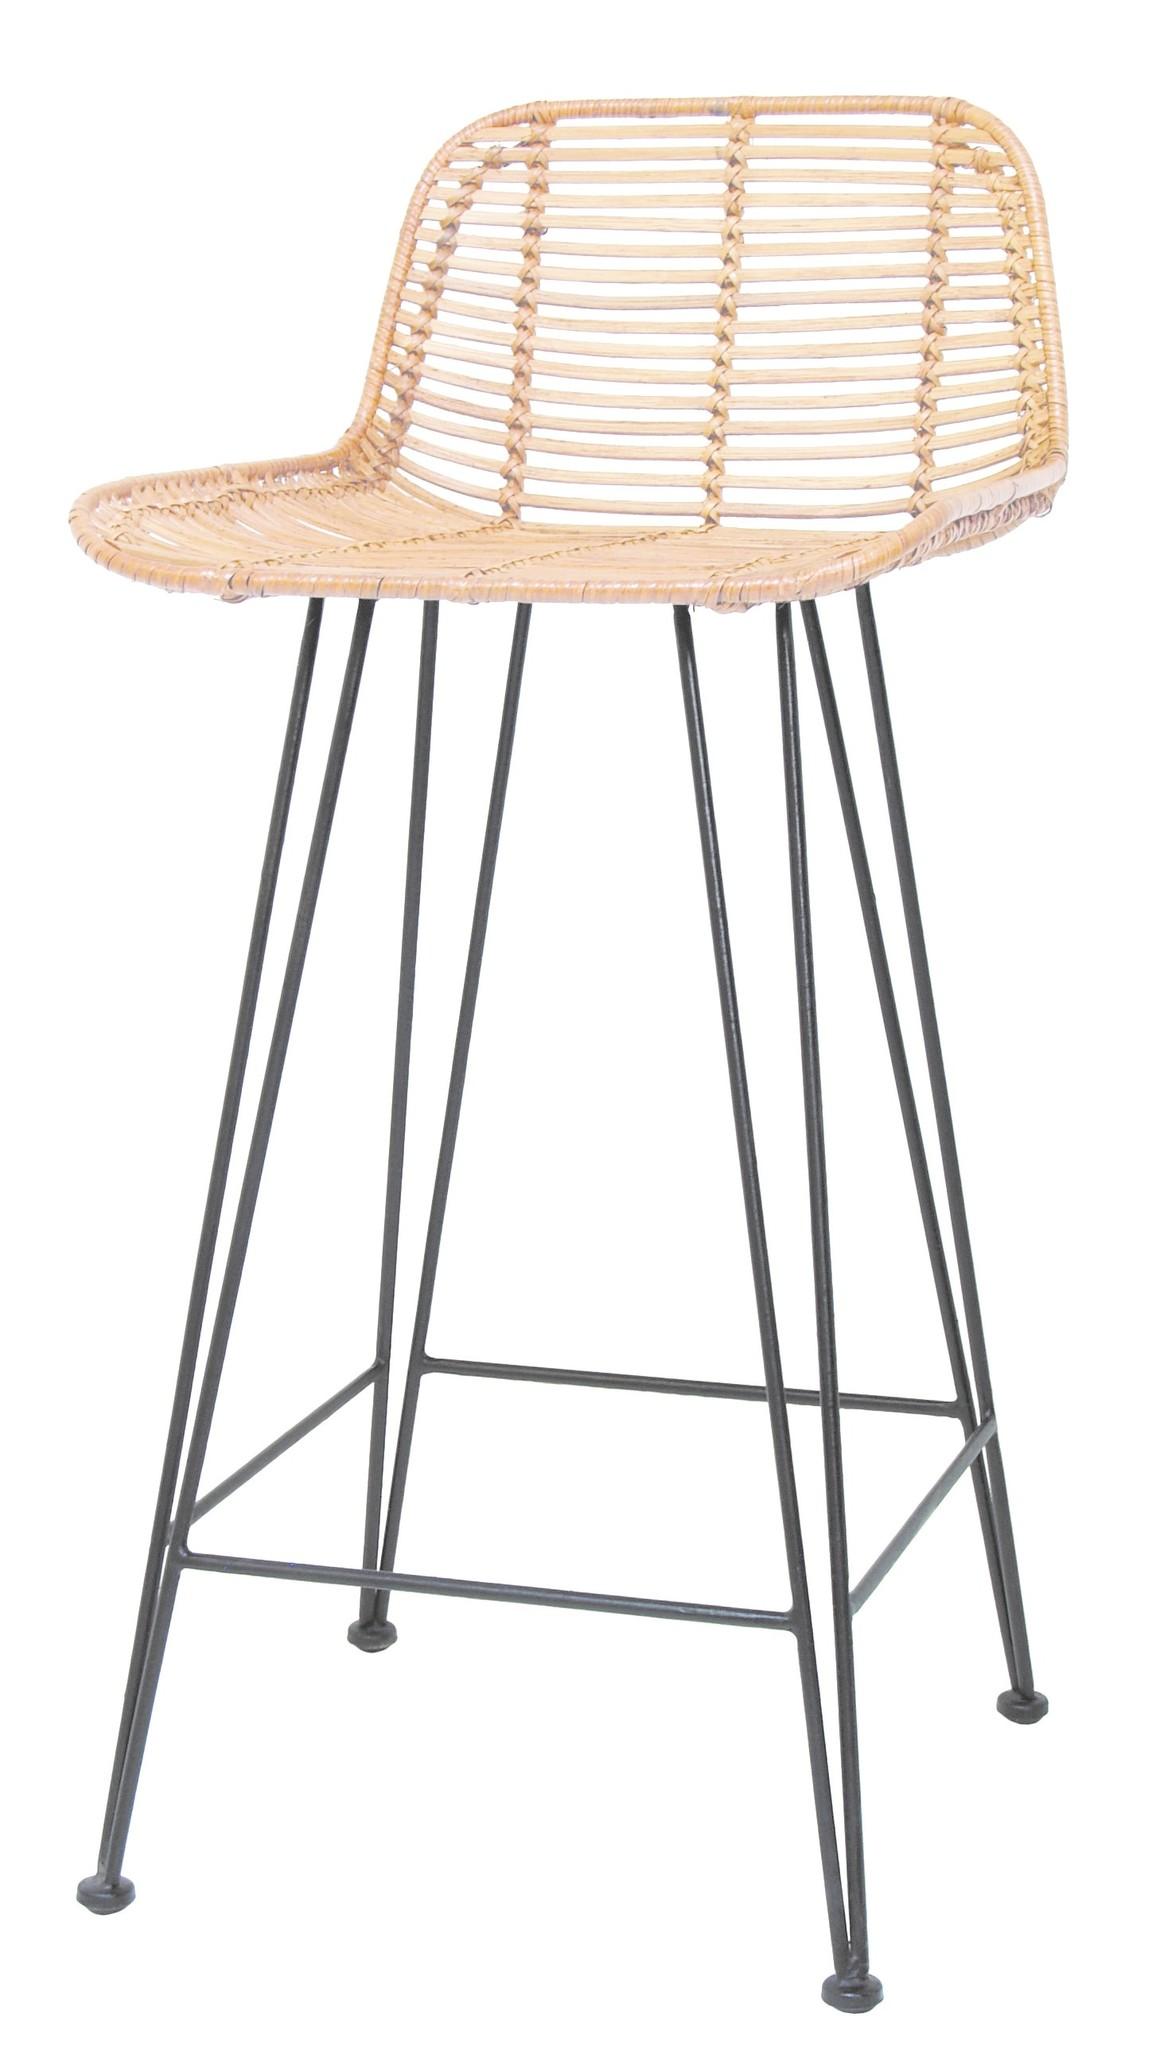 Barstoel rattan bar stool 42x47x89cm Natural-1